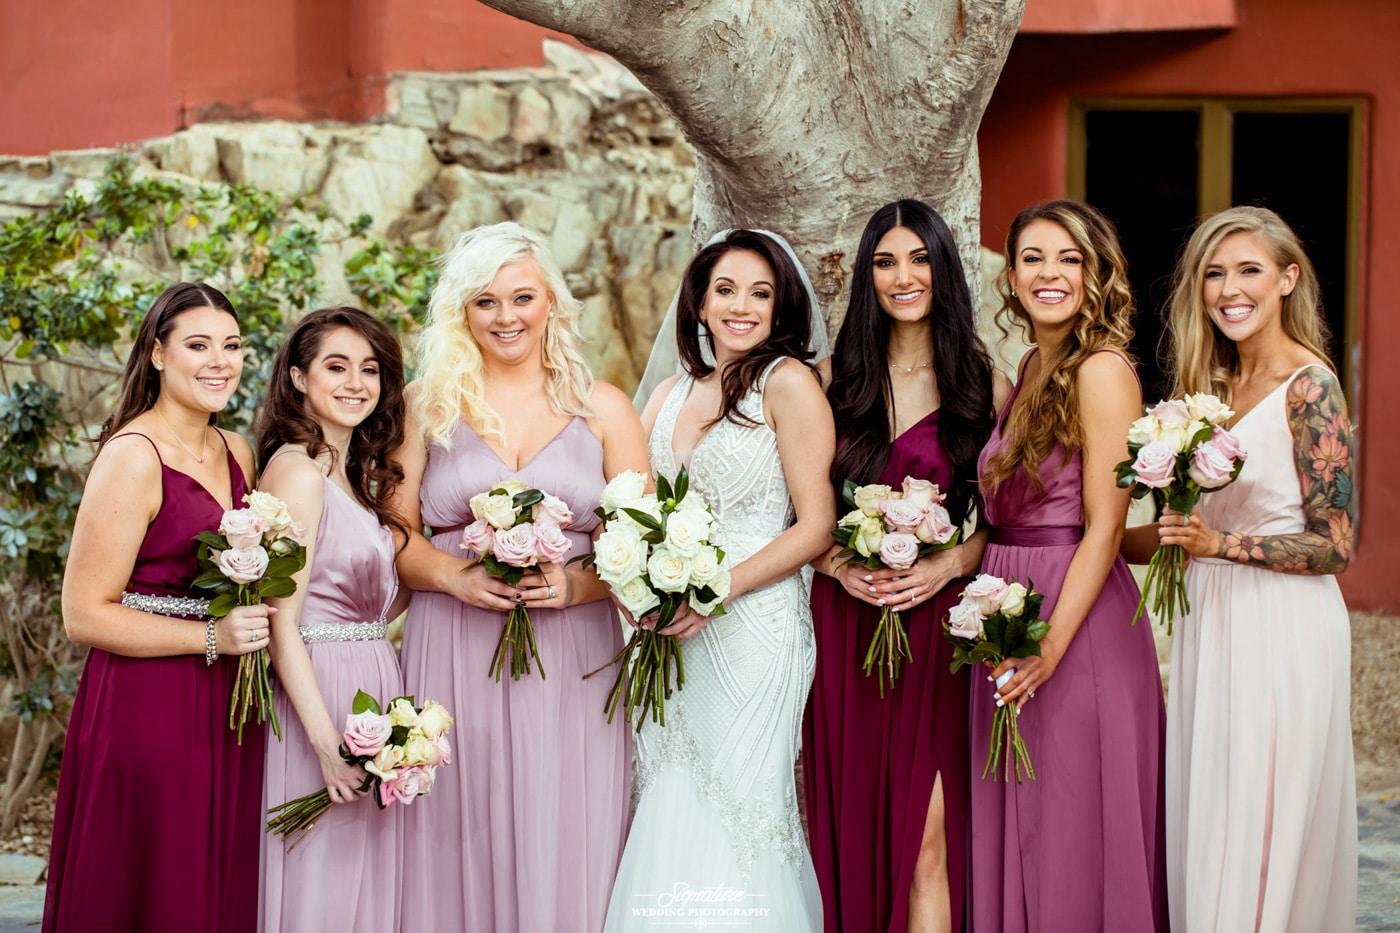 bride and bridesmaid photography 10